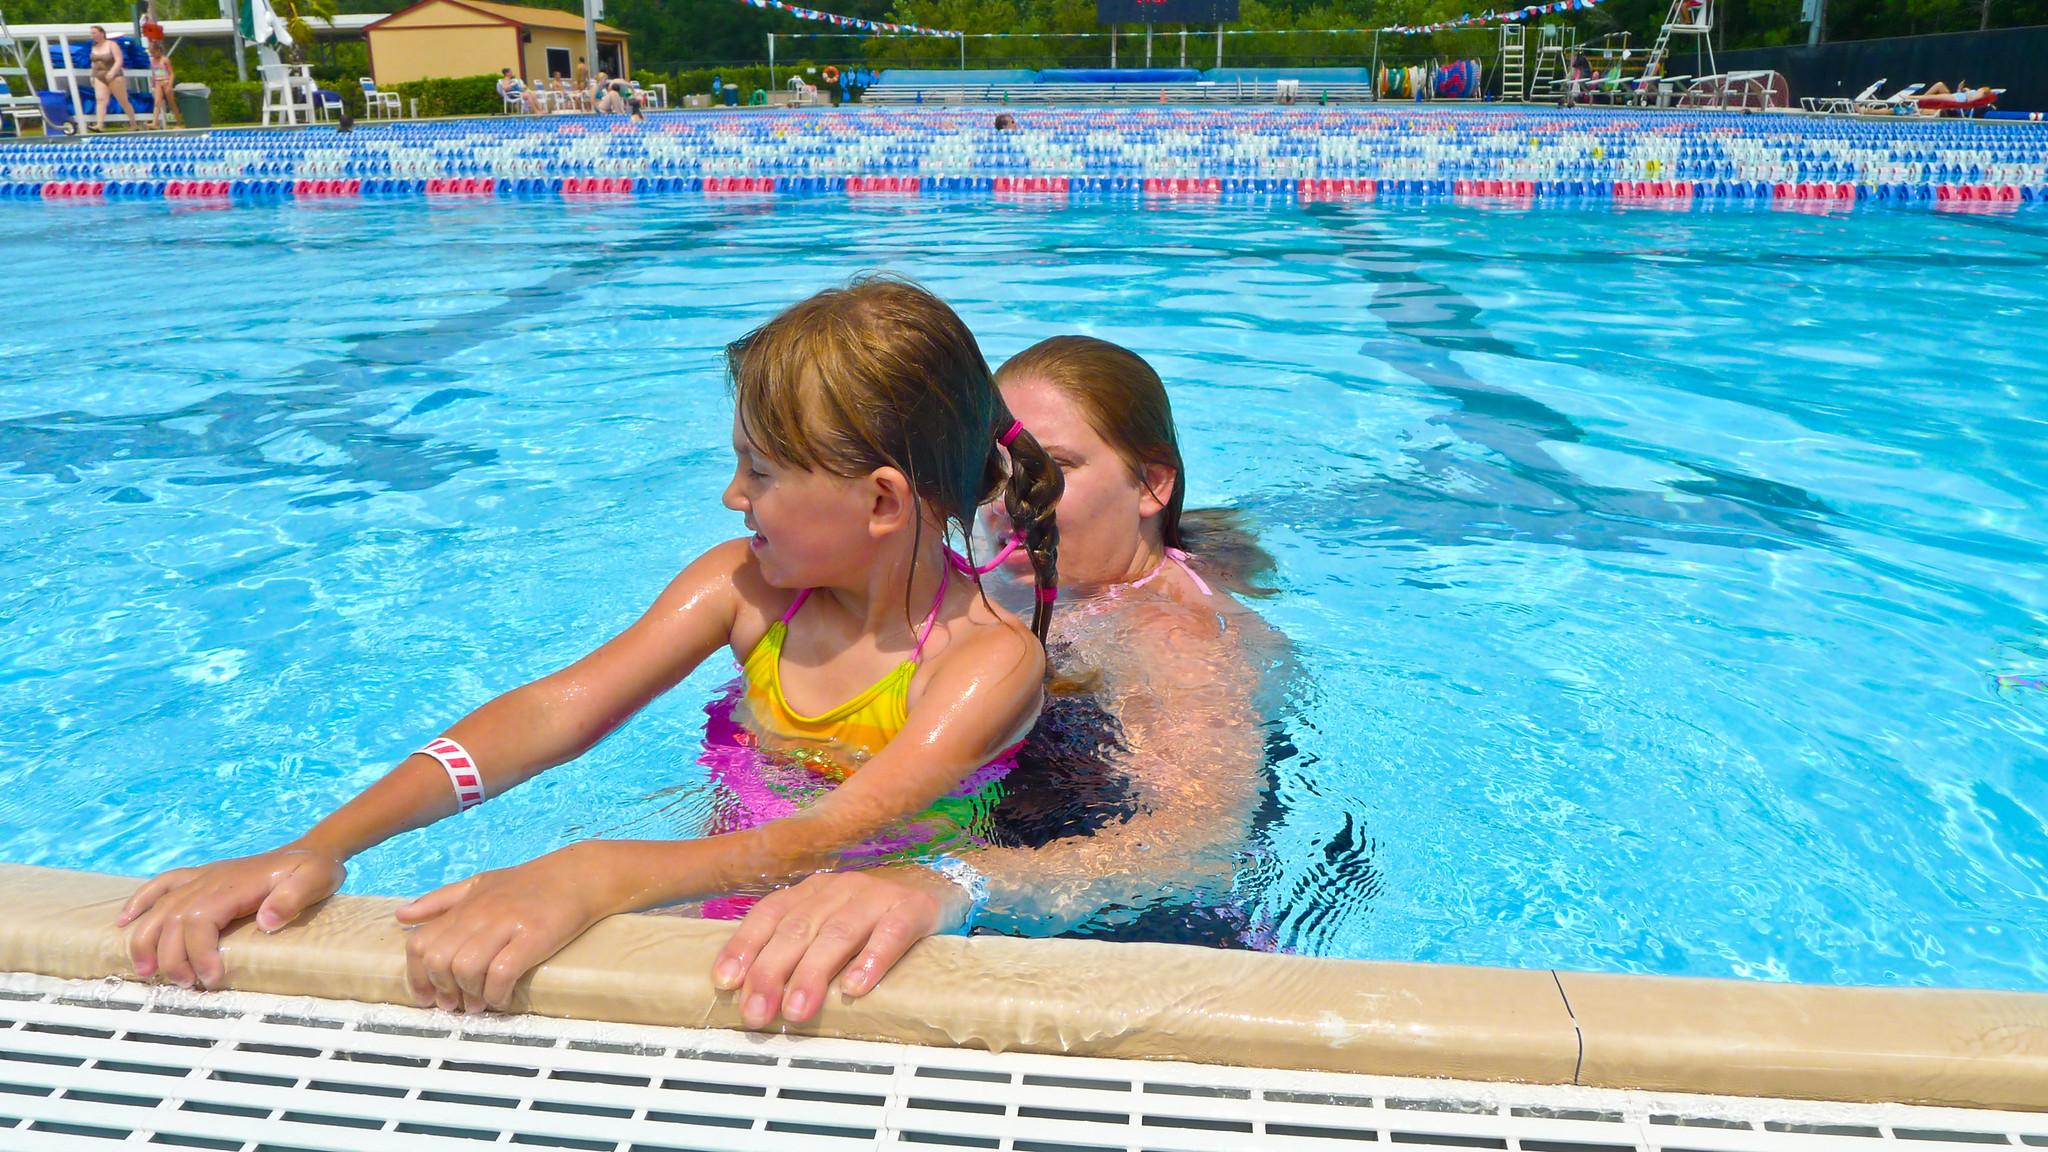 Swim Instructor Teaching Girl To Swim